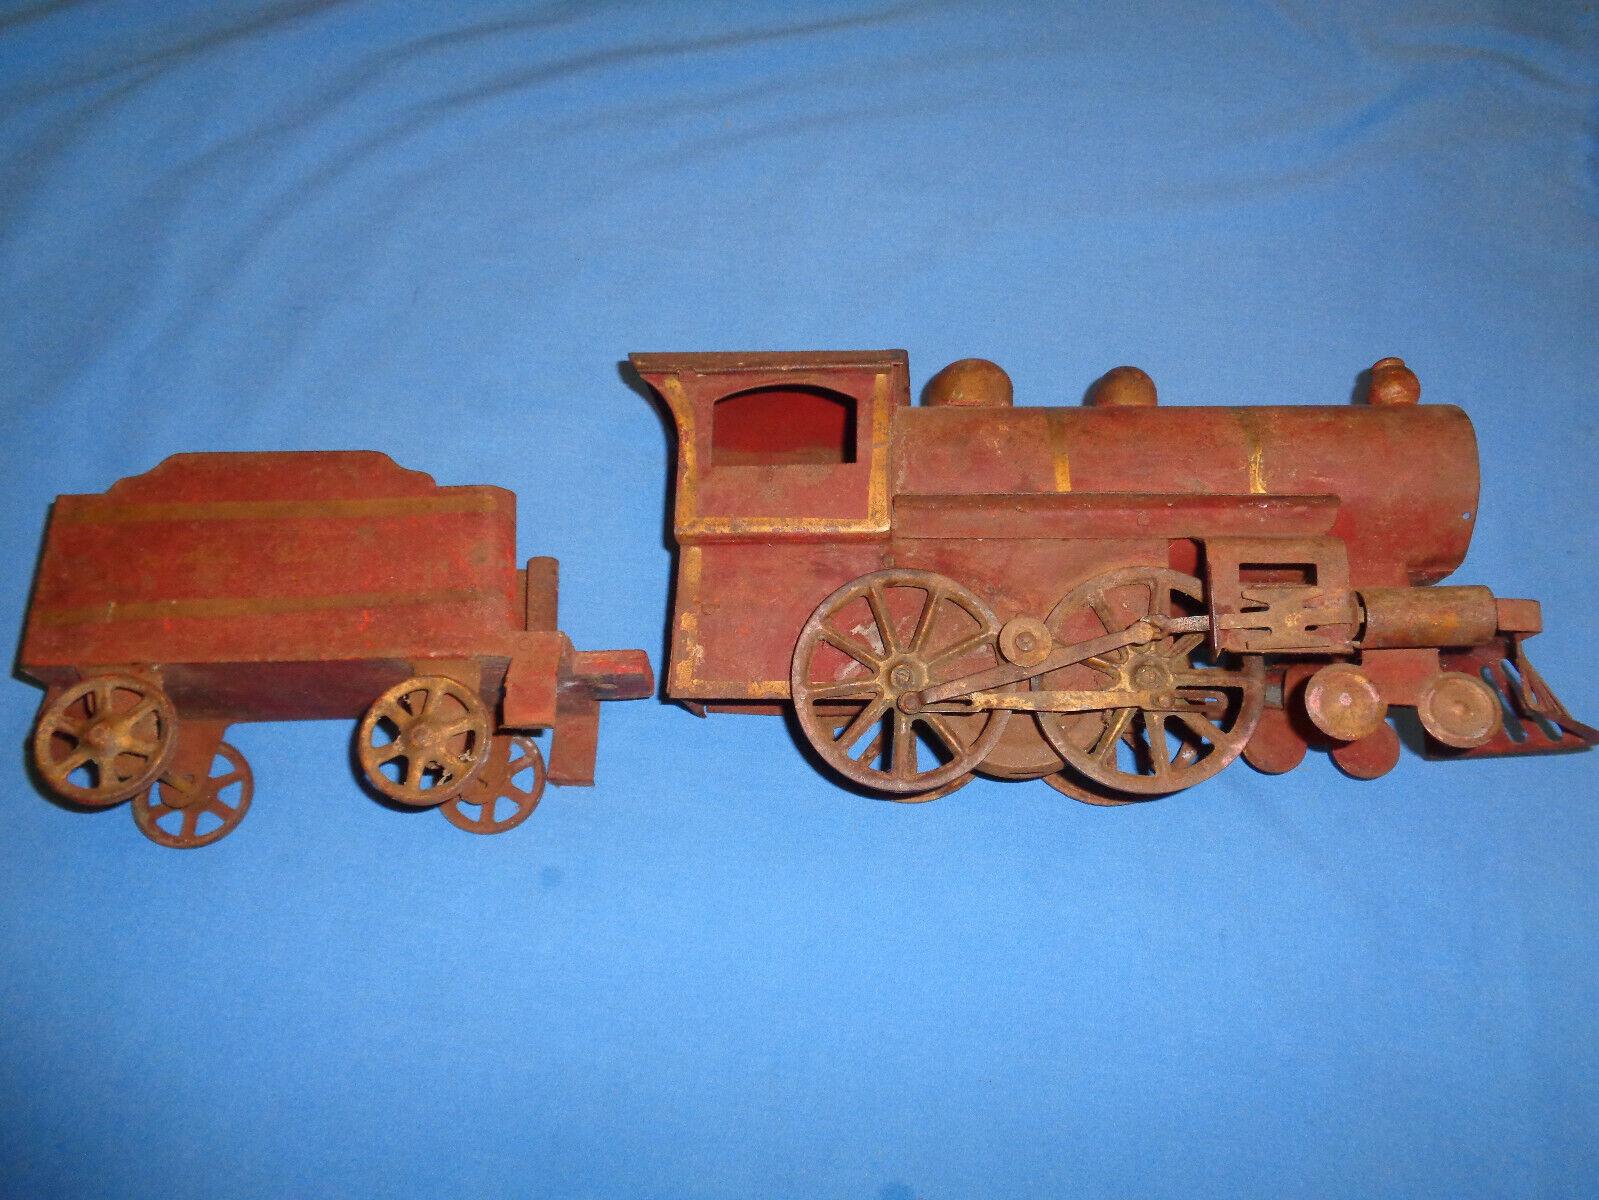 Vintage Dayton Dayton Dayton Hill Climber Steam Locomotive and Tender 8ab